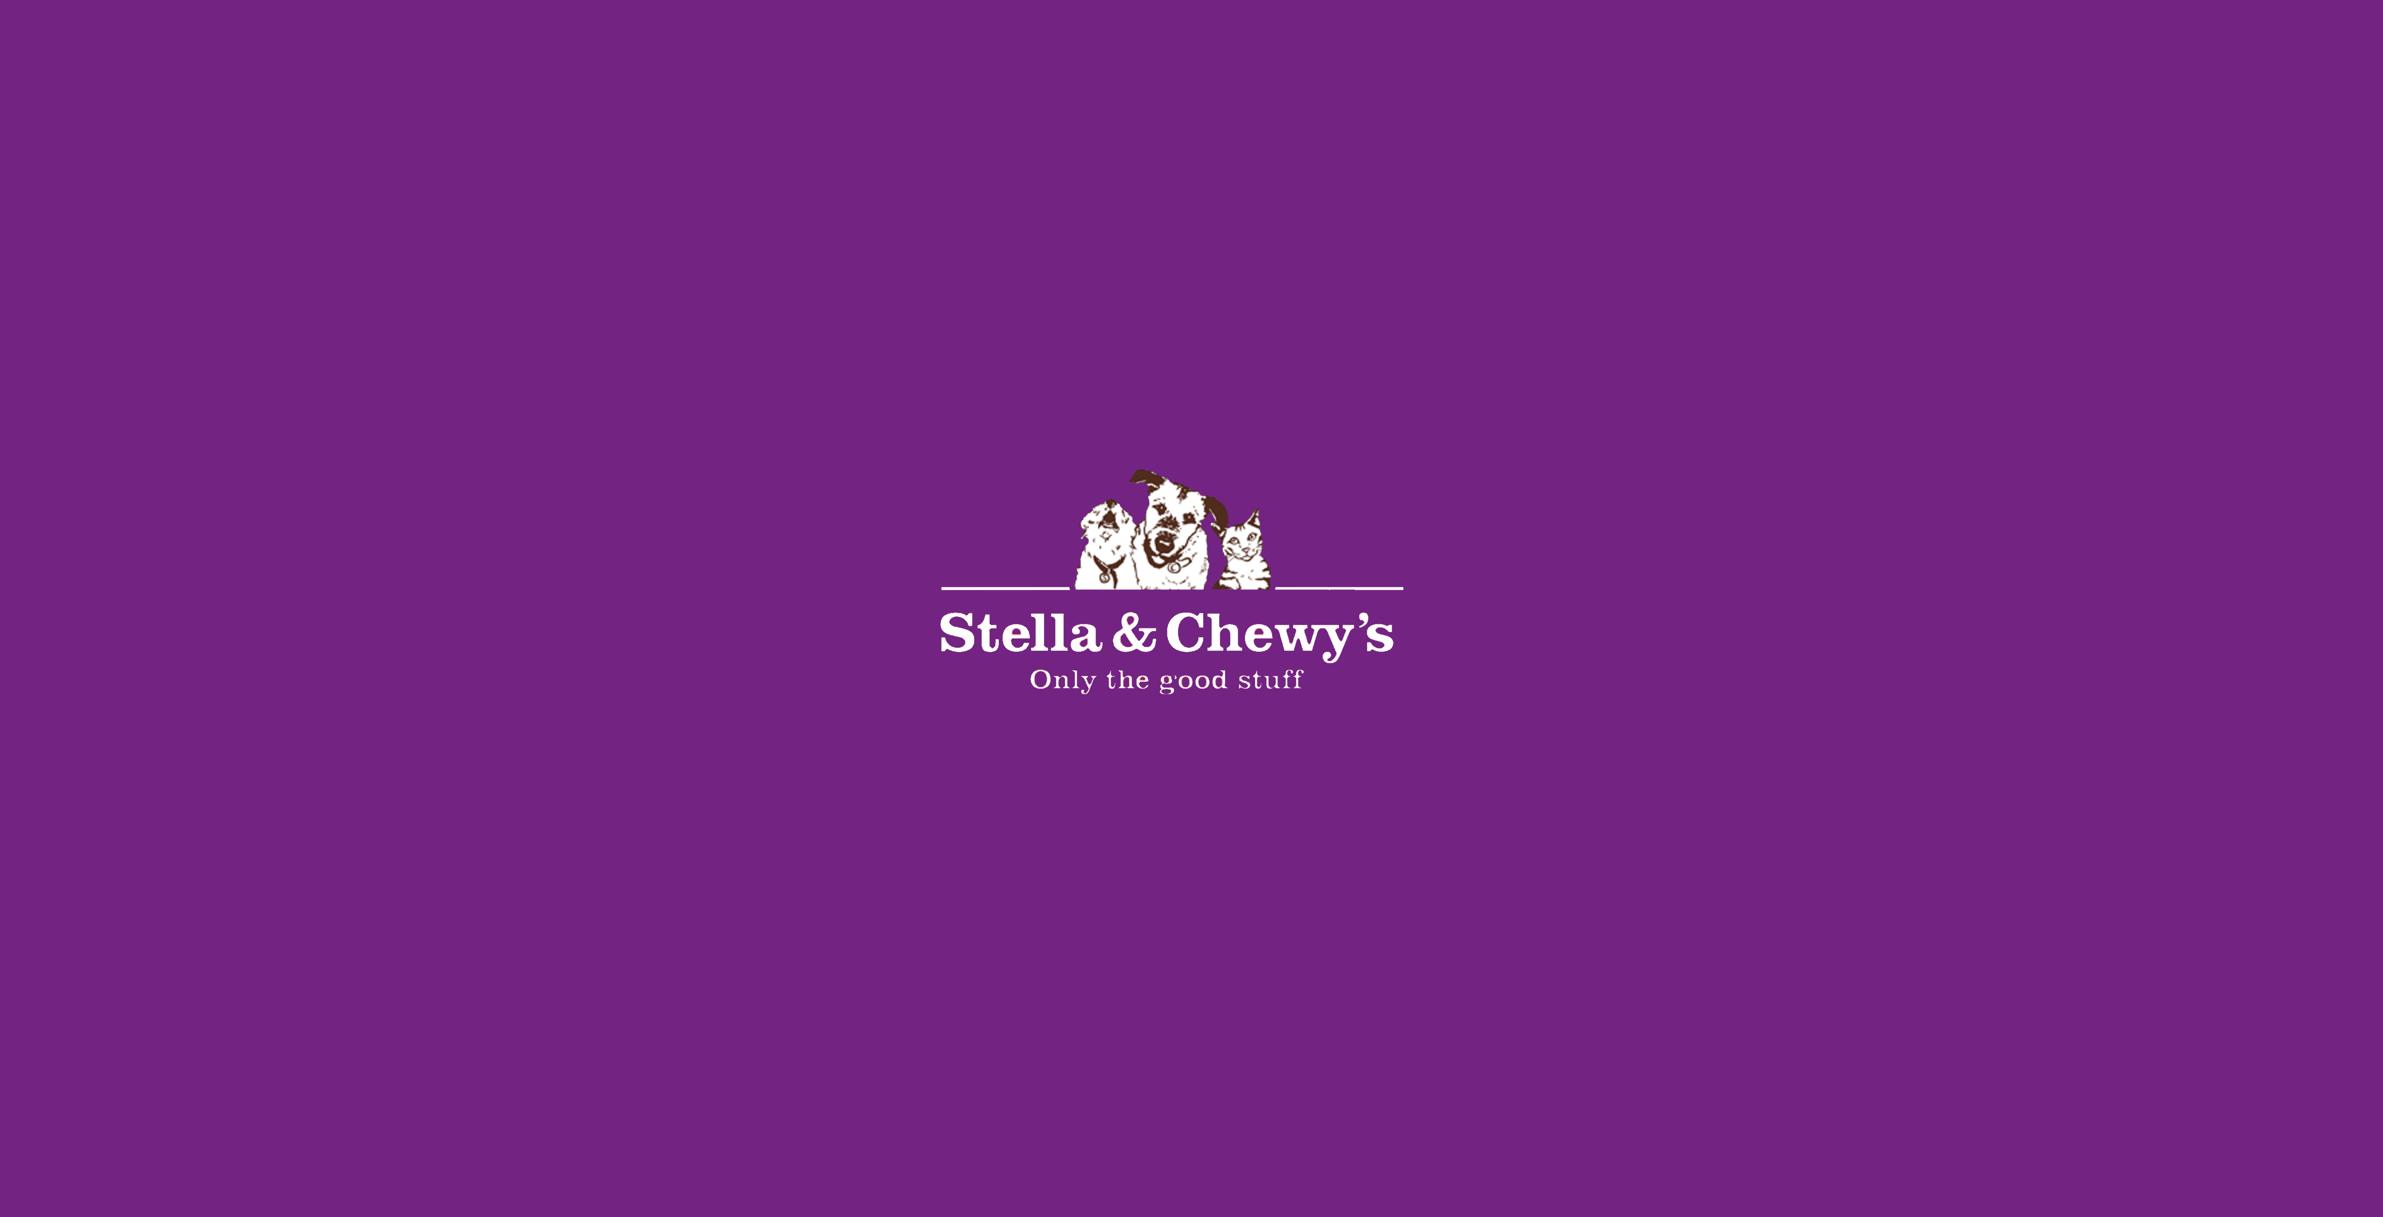 Stella & Chewy Cat